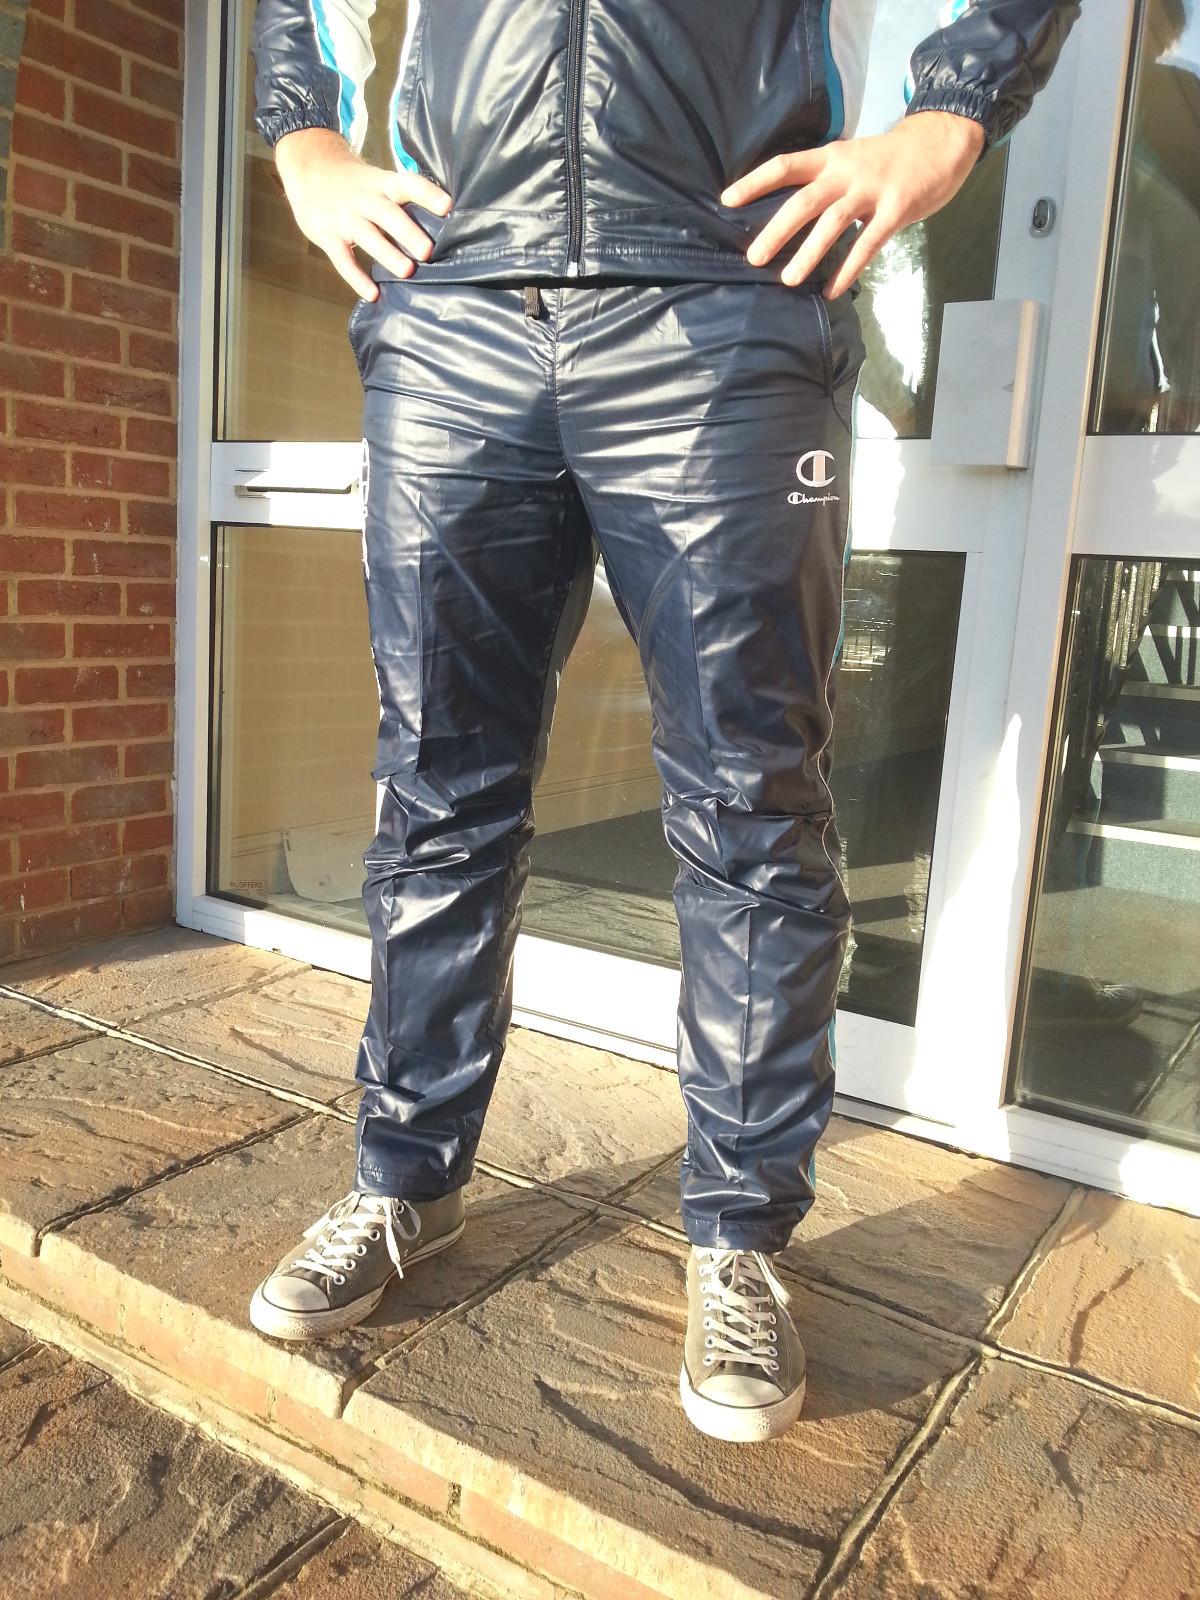 Men's Champion Shiny Tracksuit Hands on Hips